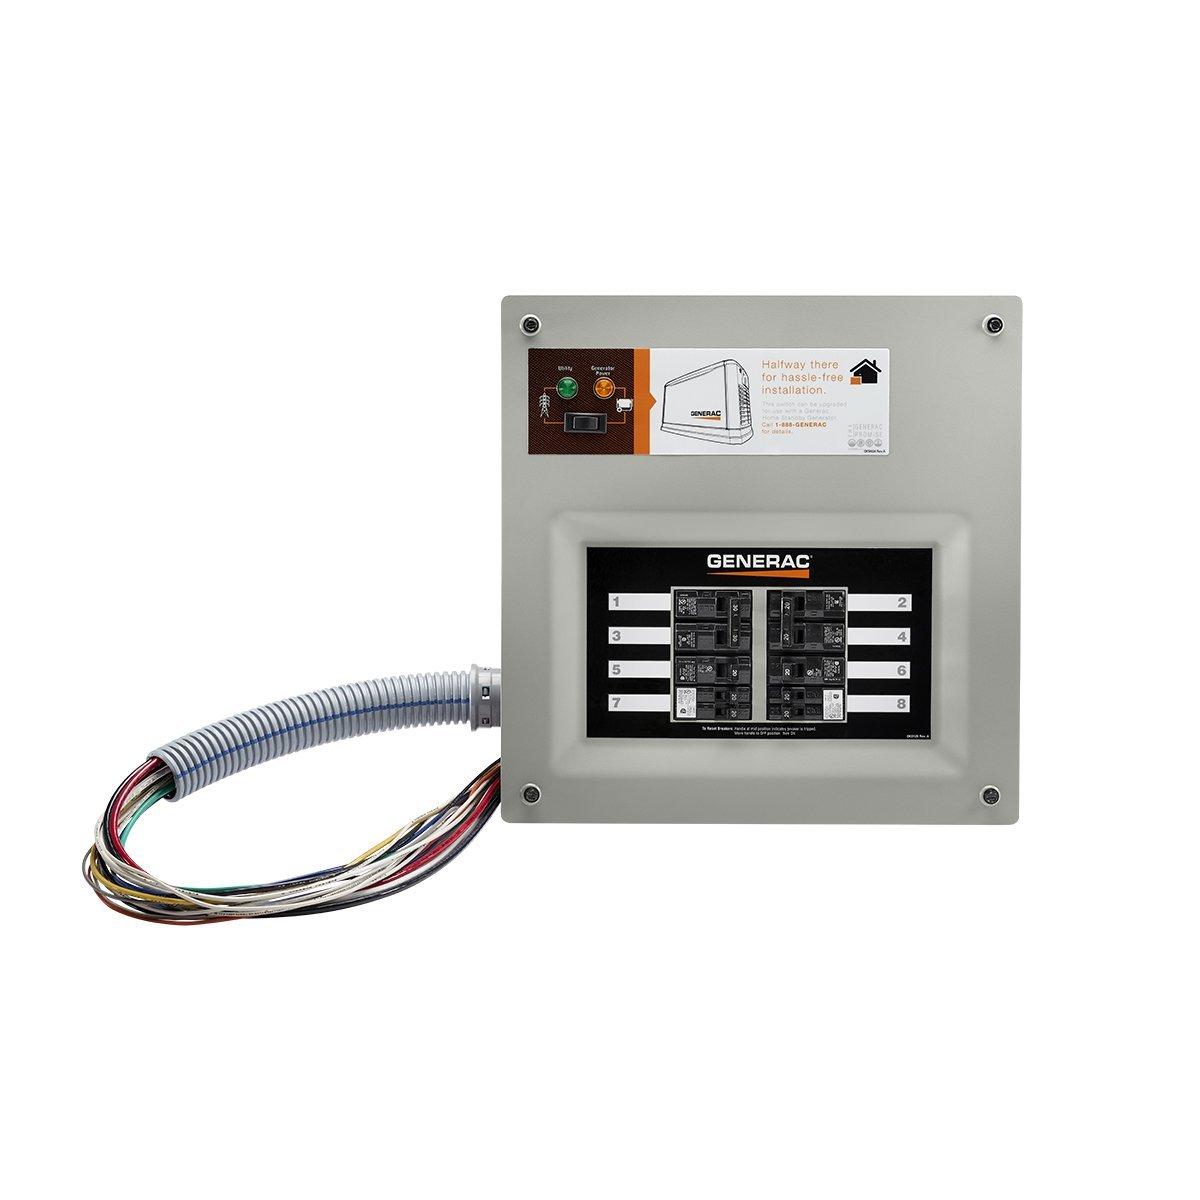 MNL-5624] Generac Manual Transfer Switch 6295   2019 Ebook Liry on